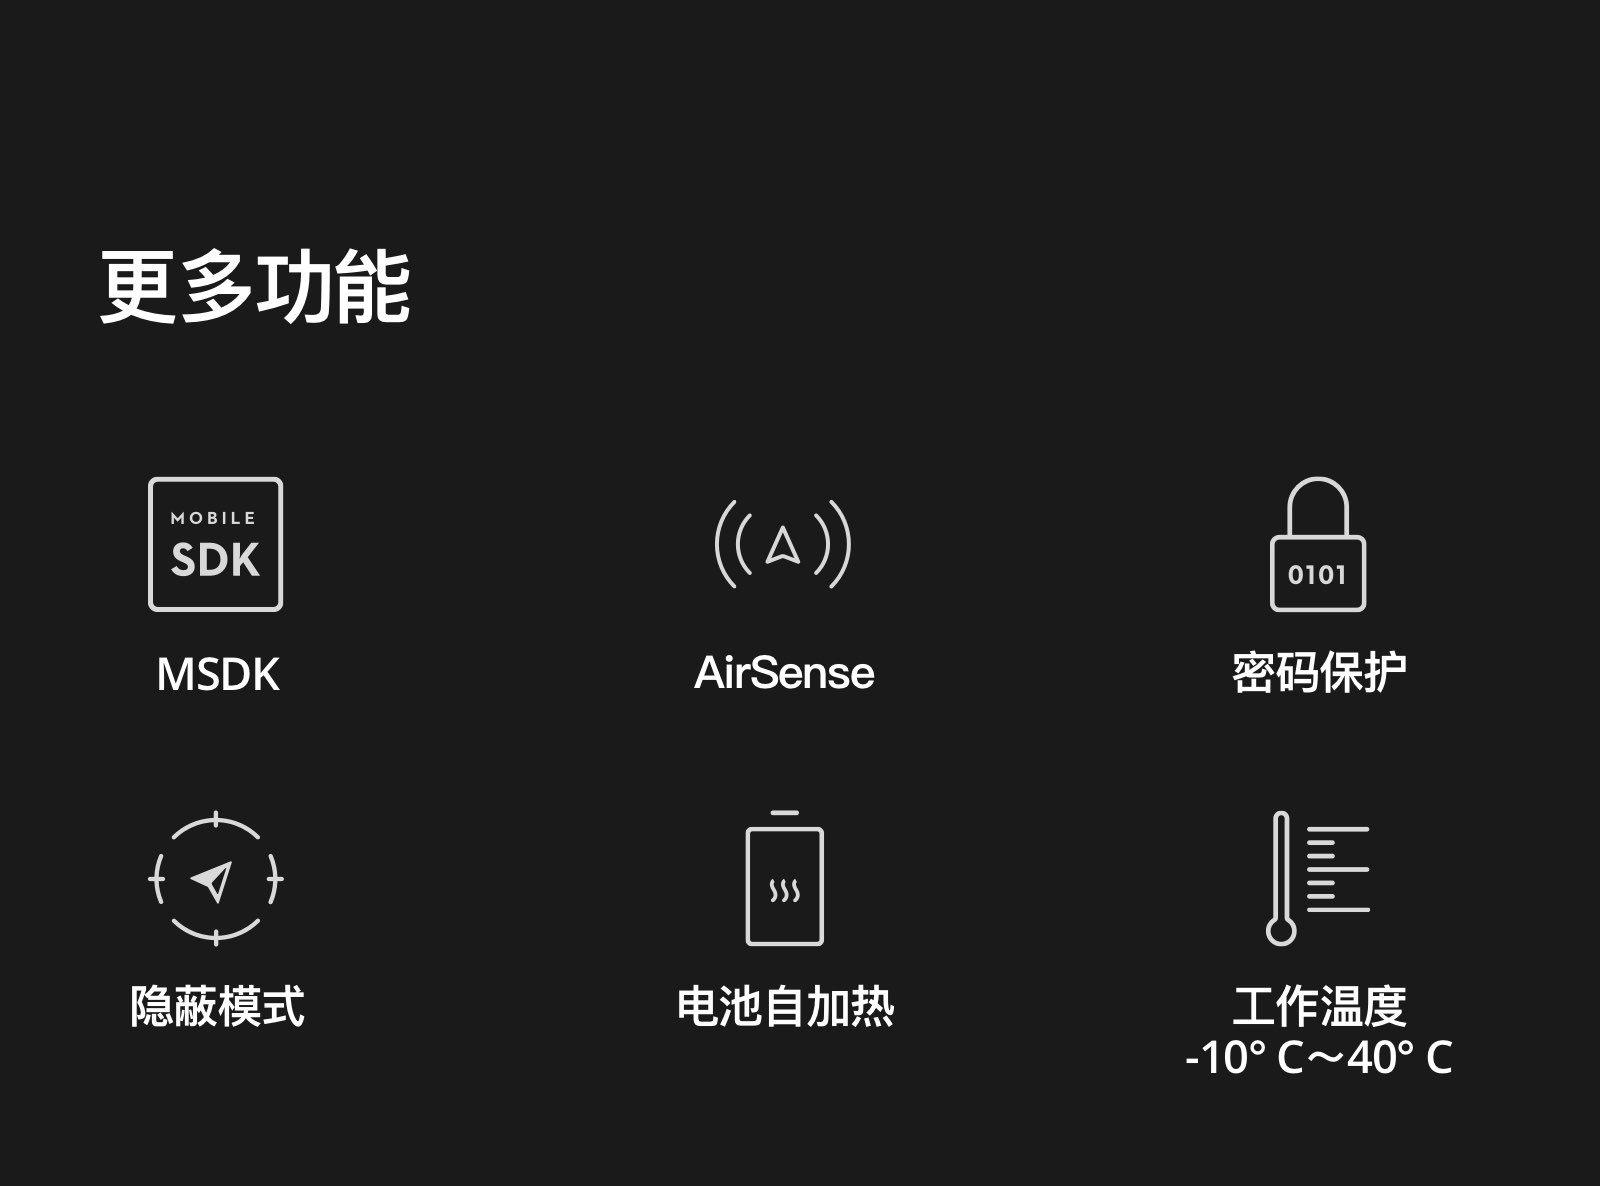 M2EA_PC%20_cn_10.jpg